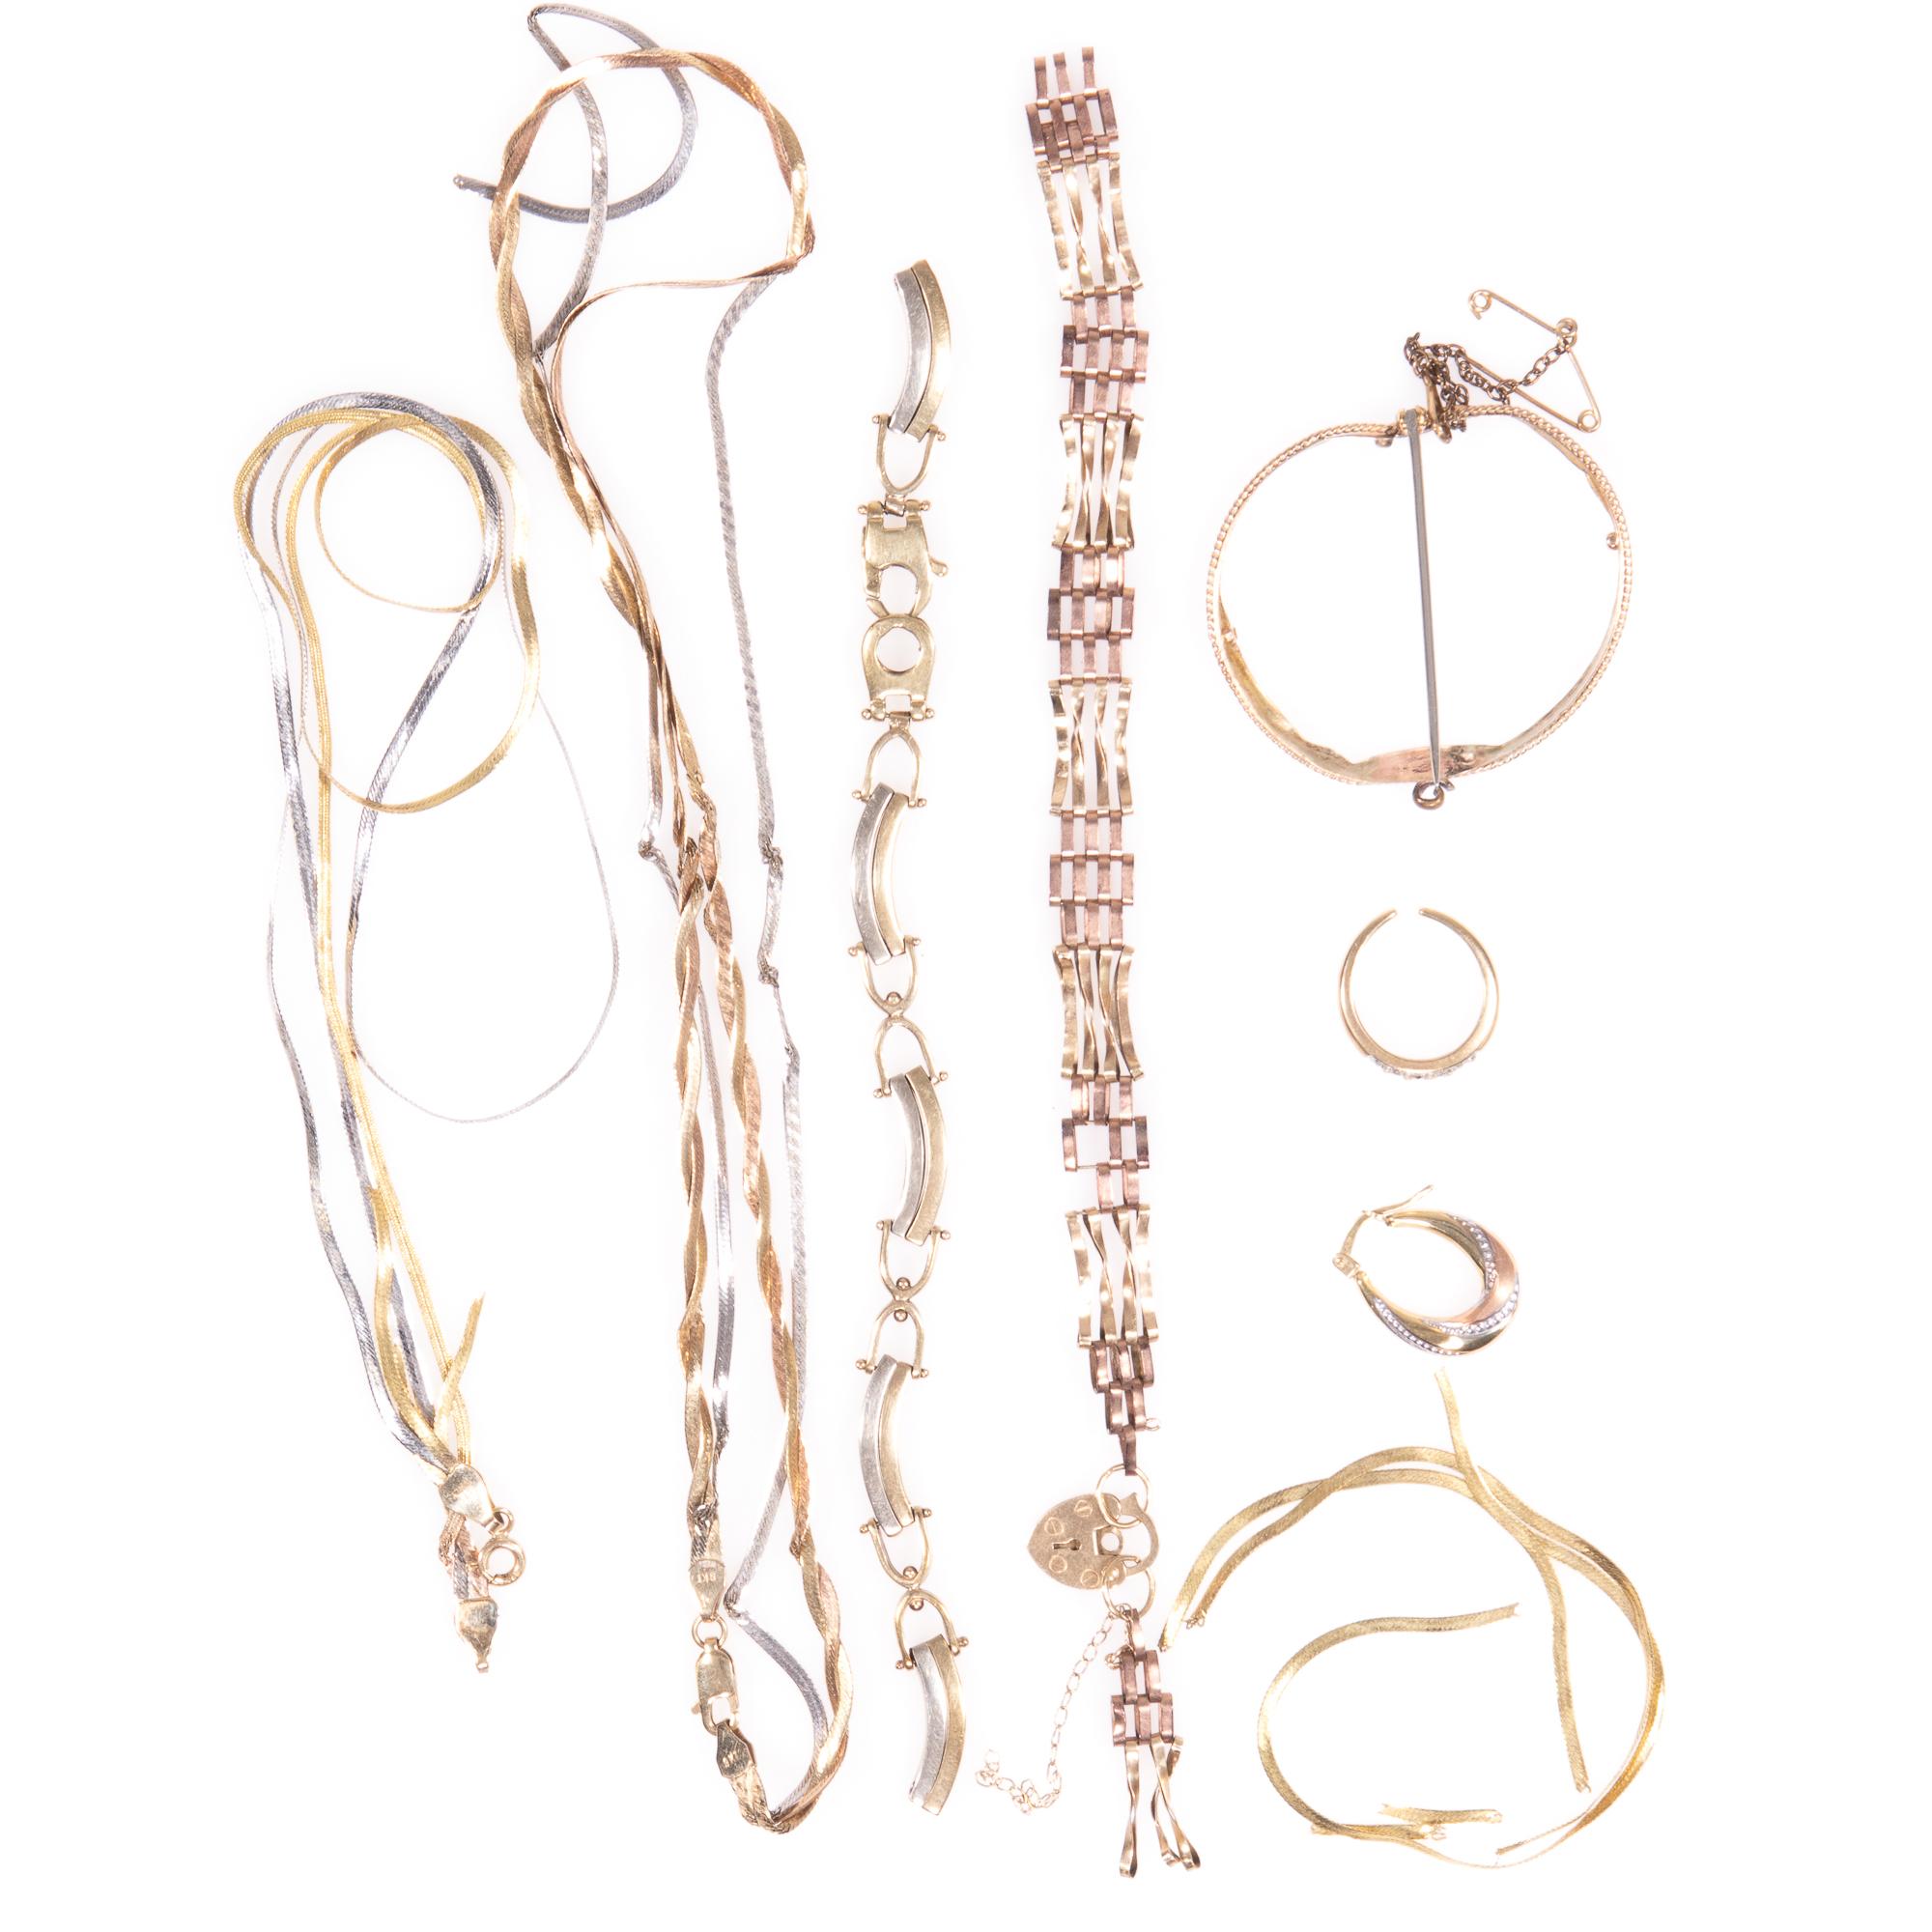 26 grams Scrap Gold Jewellery - Image 4 of 6